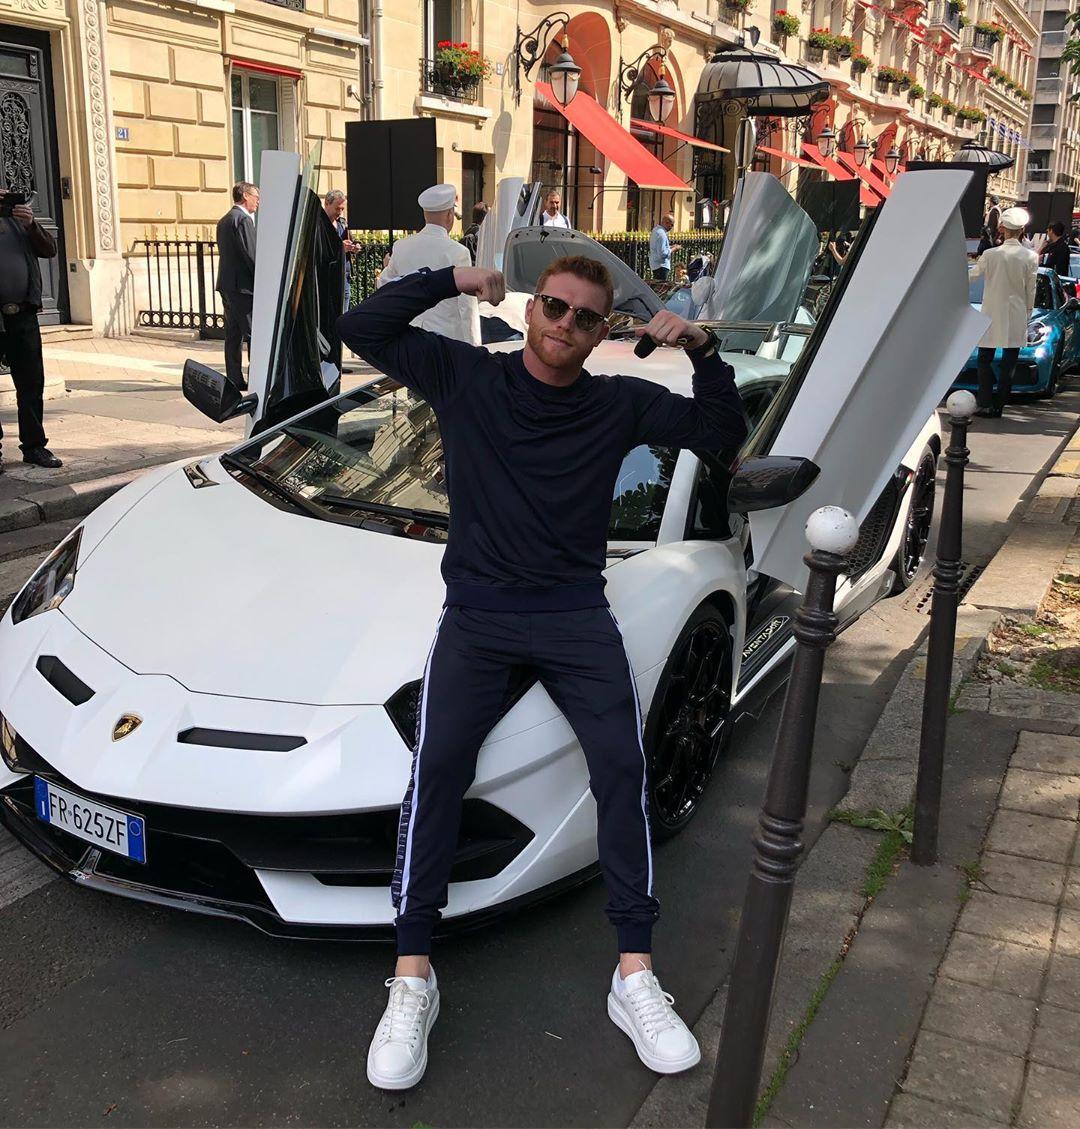 Canelo metió el acelerador a fondo a bordo de un Lamborghini Aventador SVJ